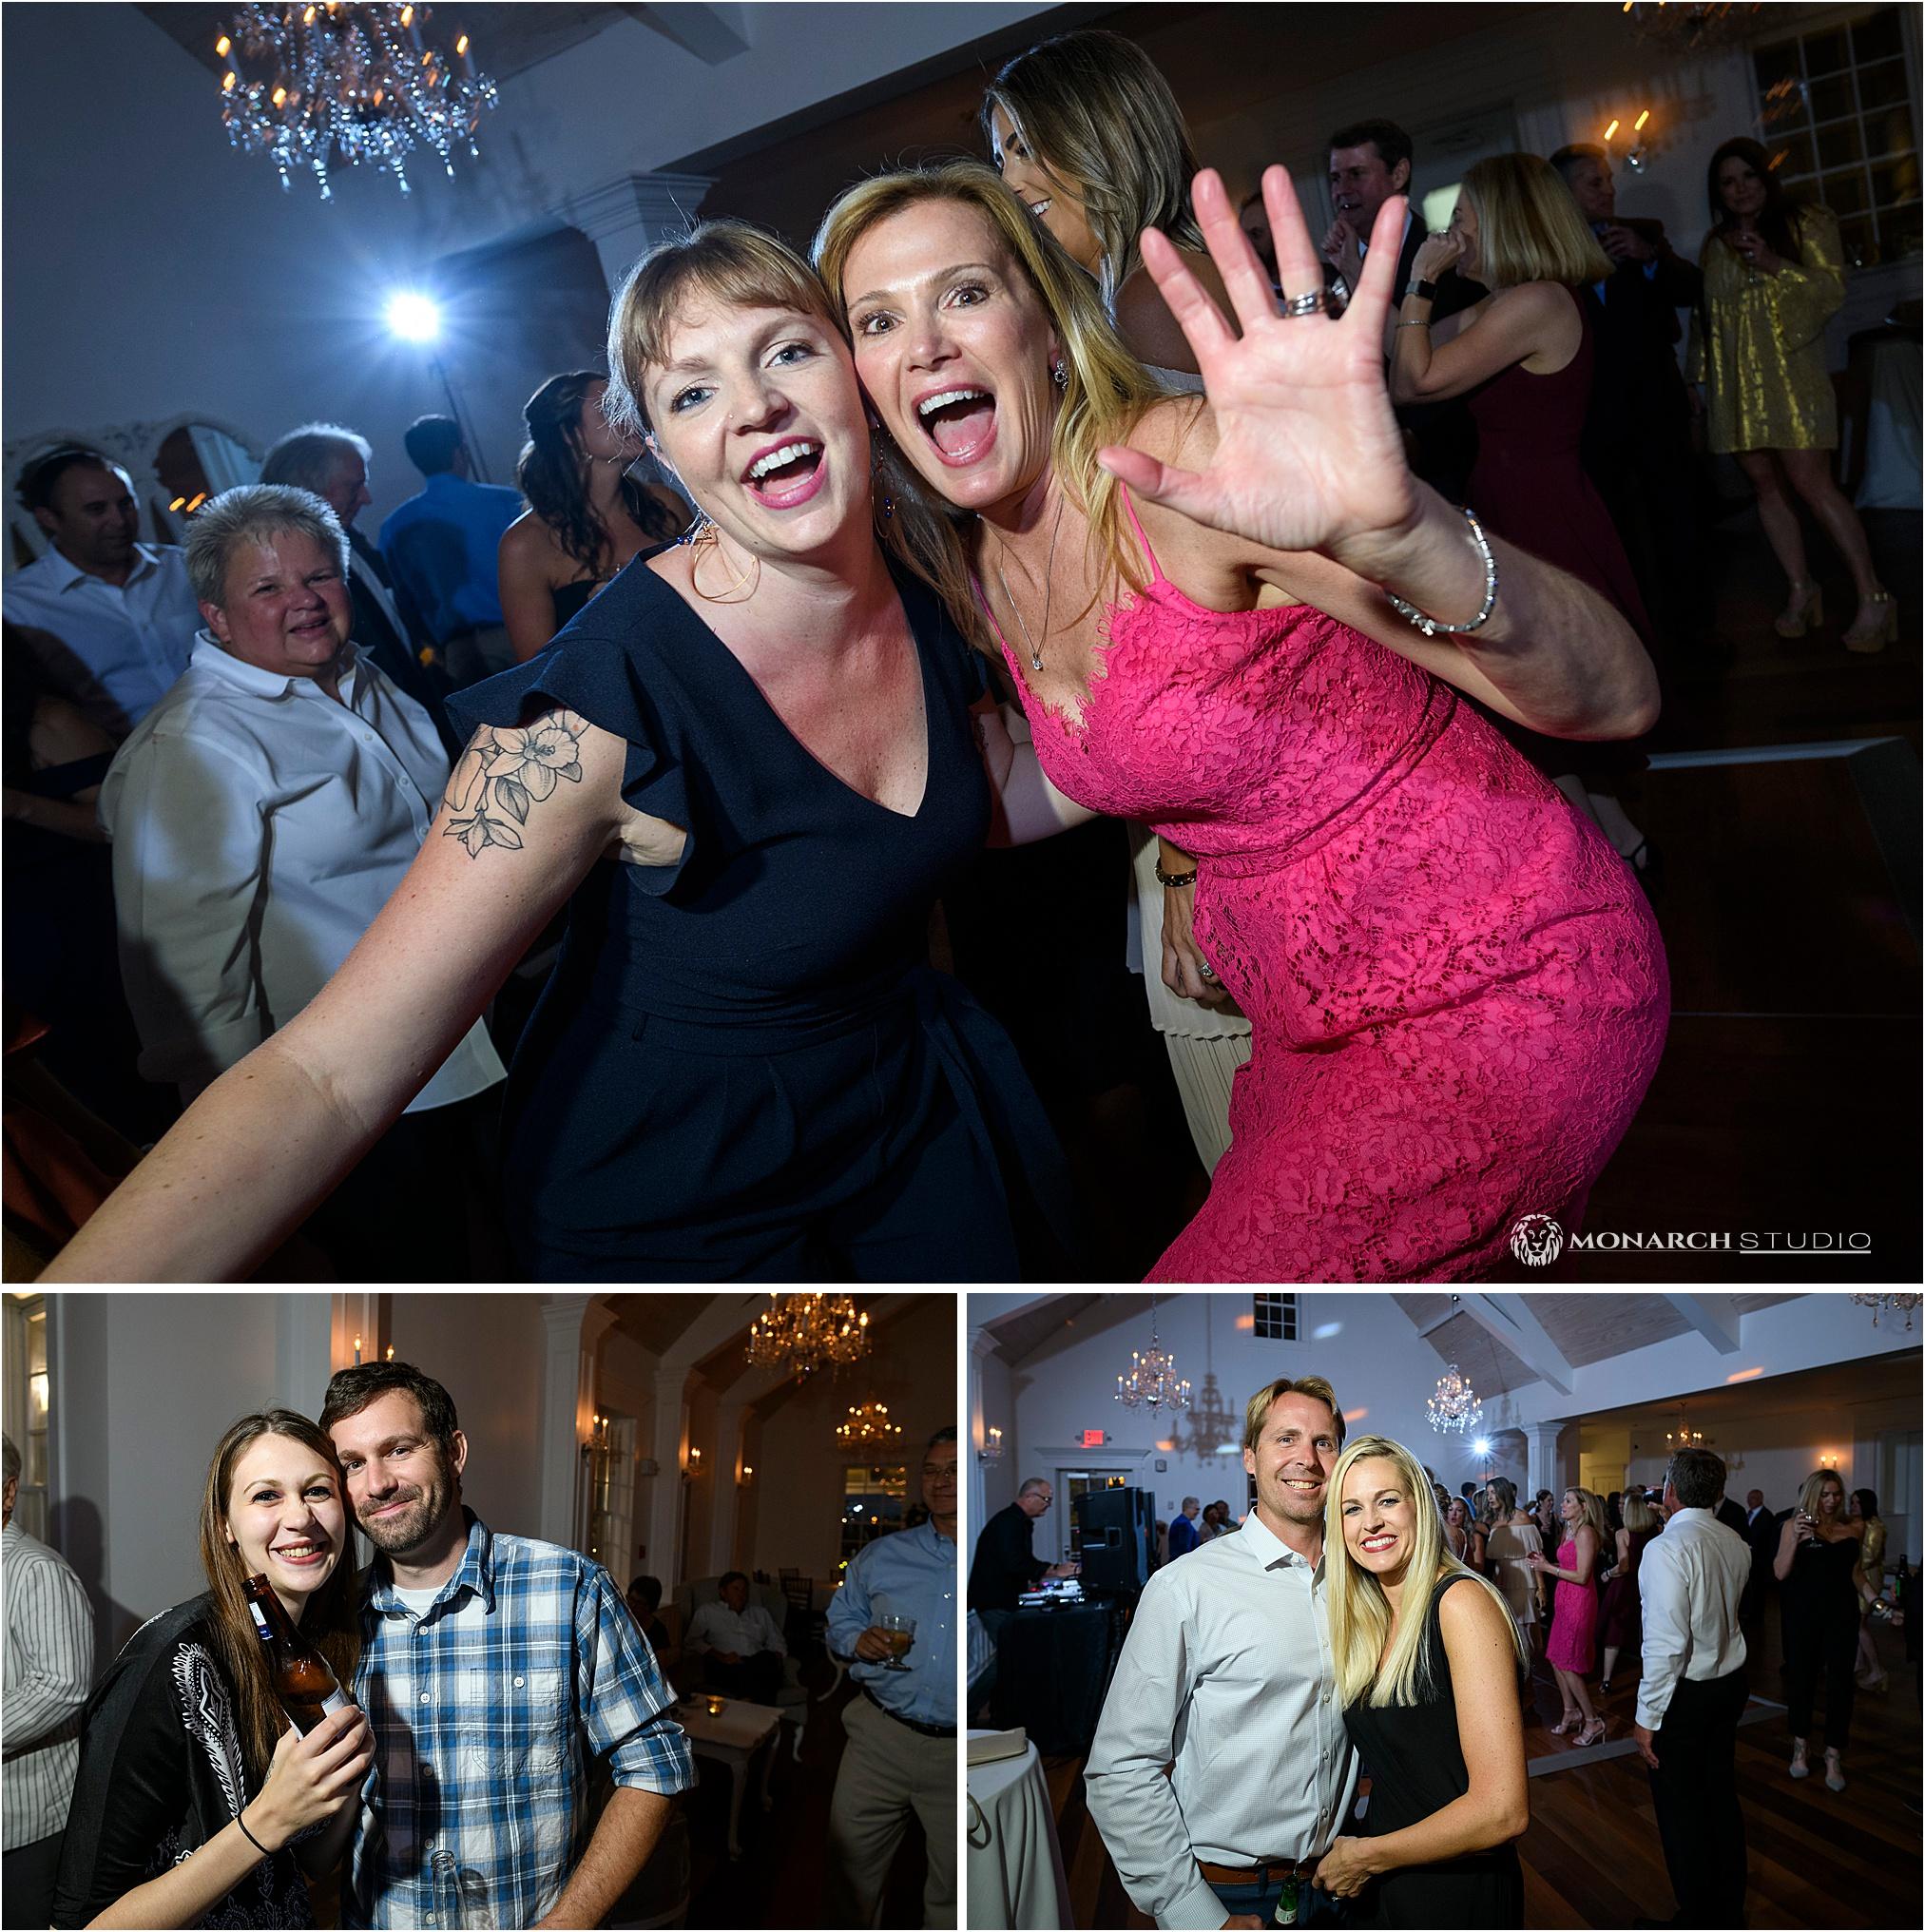 110-whiteroom-wedding-photographer-2019-05-22_0092.jpg